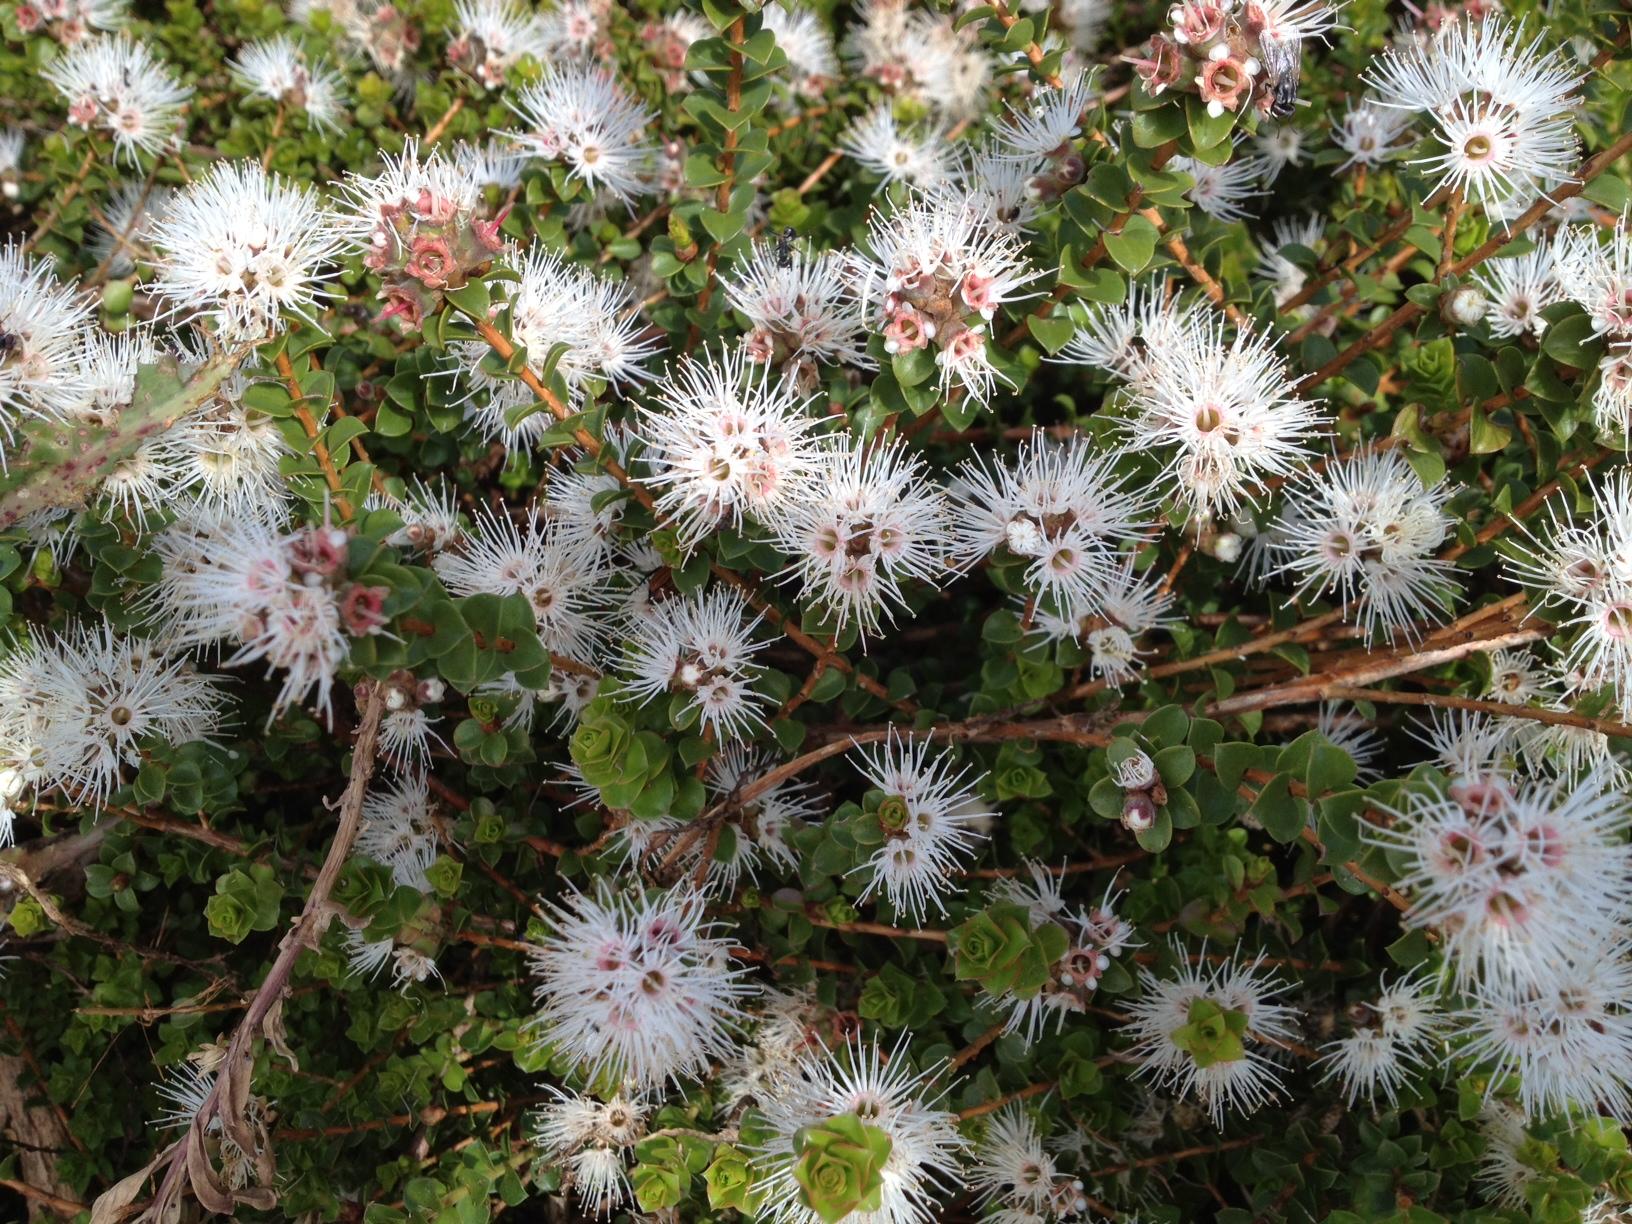 muntries flowers blooming, beautiful Australian native edible fruit